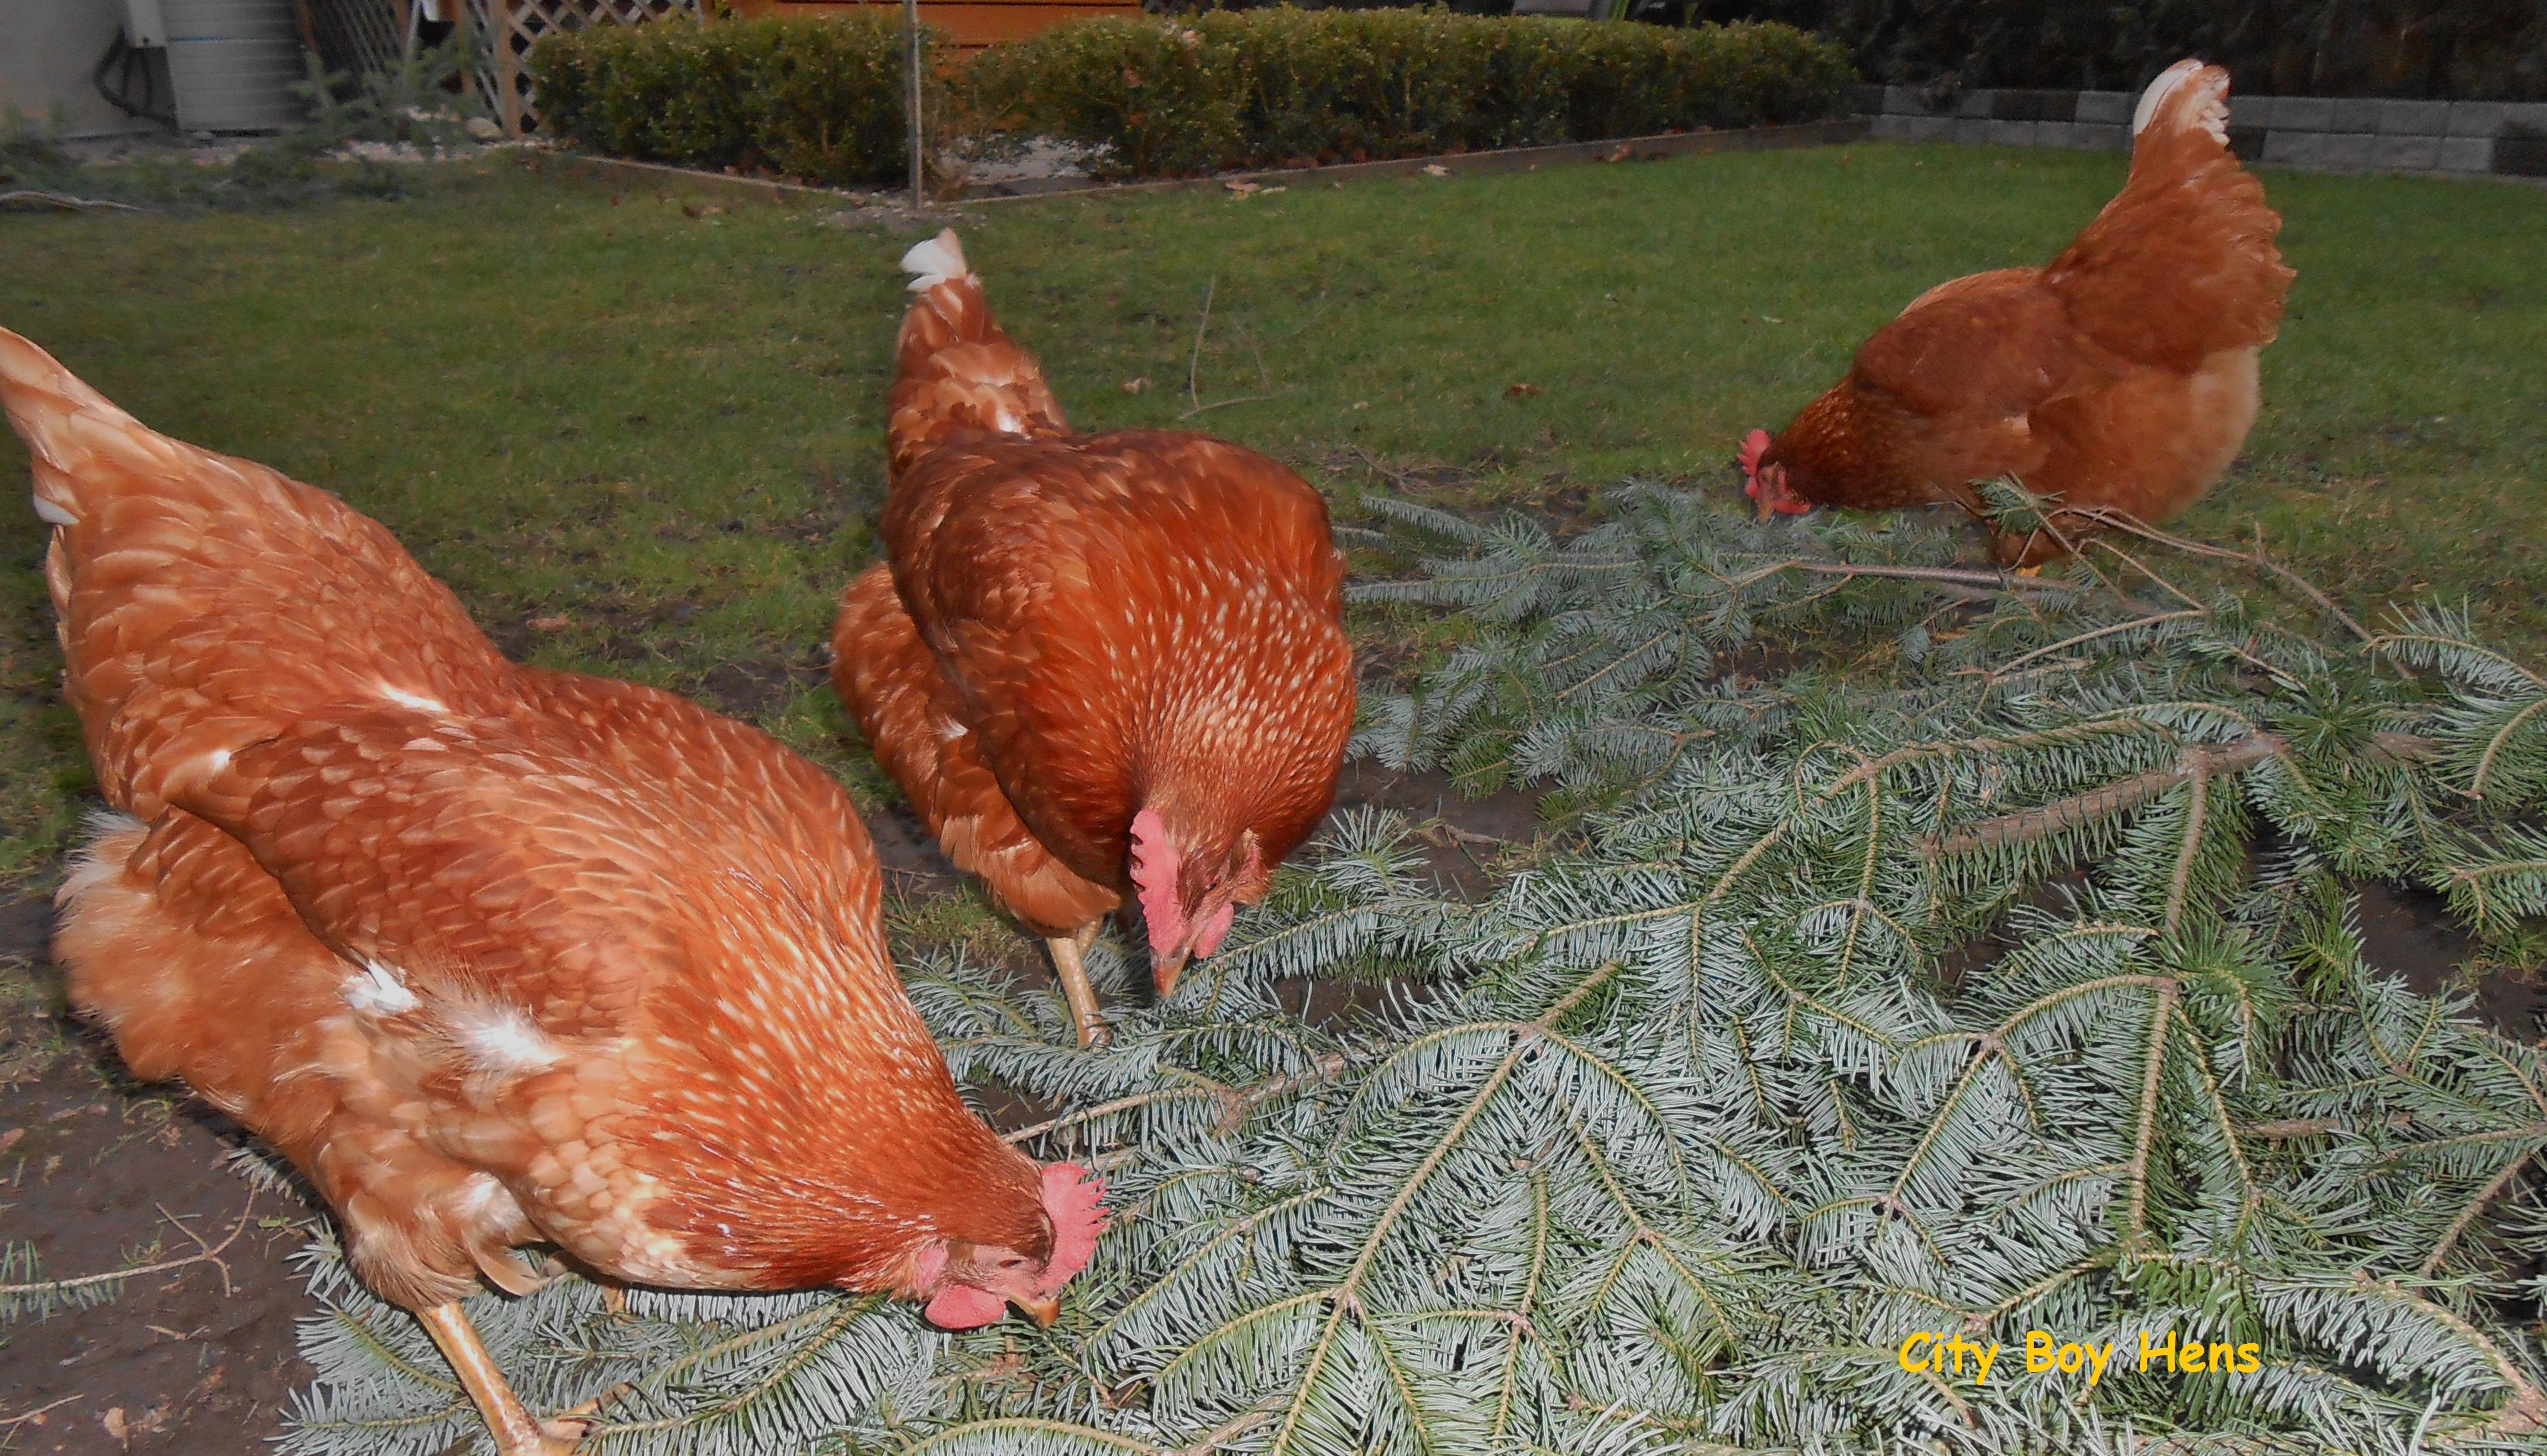 free ranging city boy hens